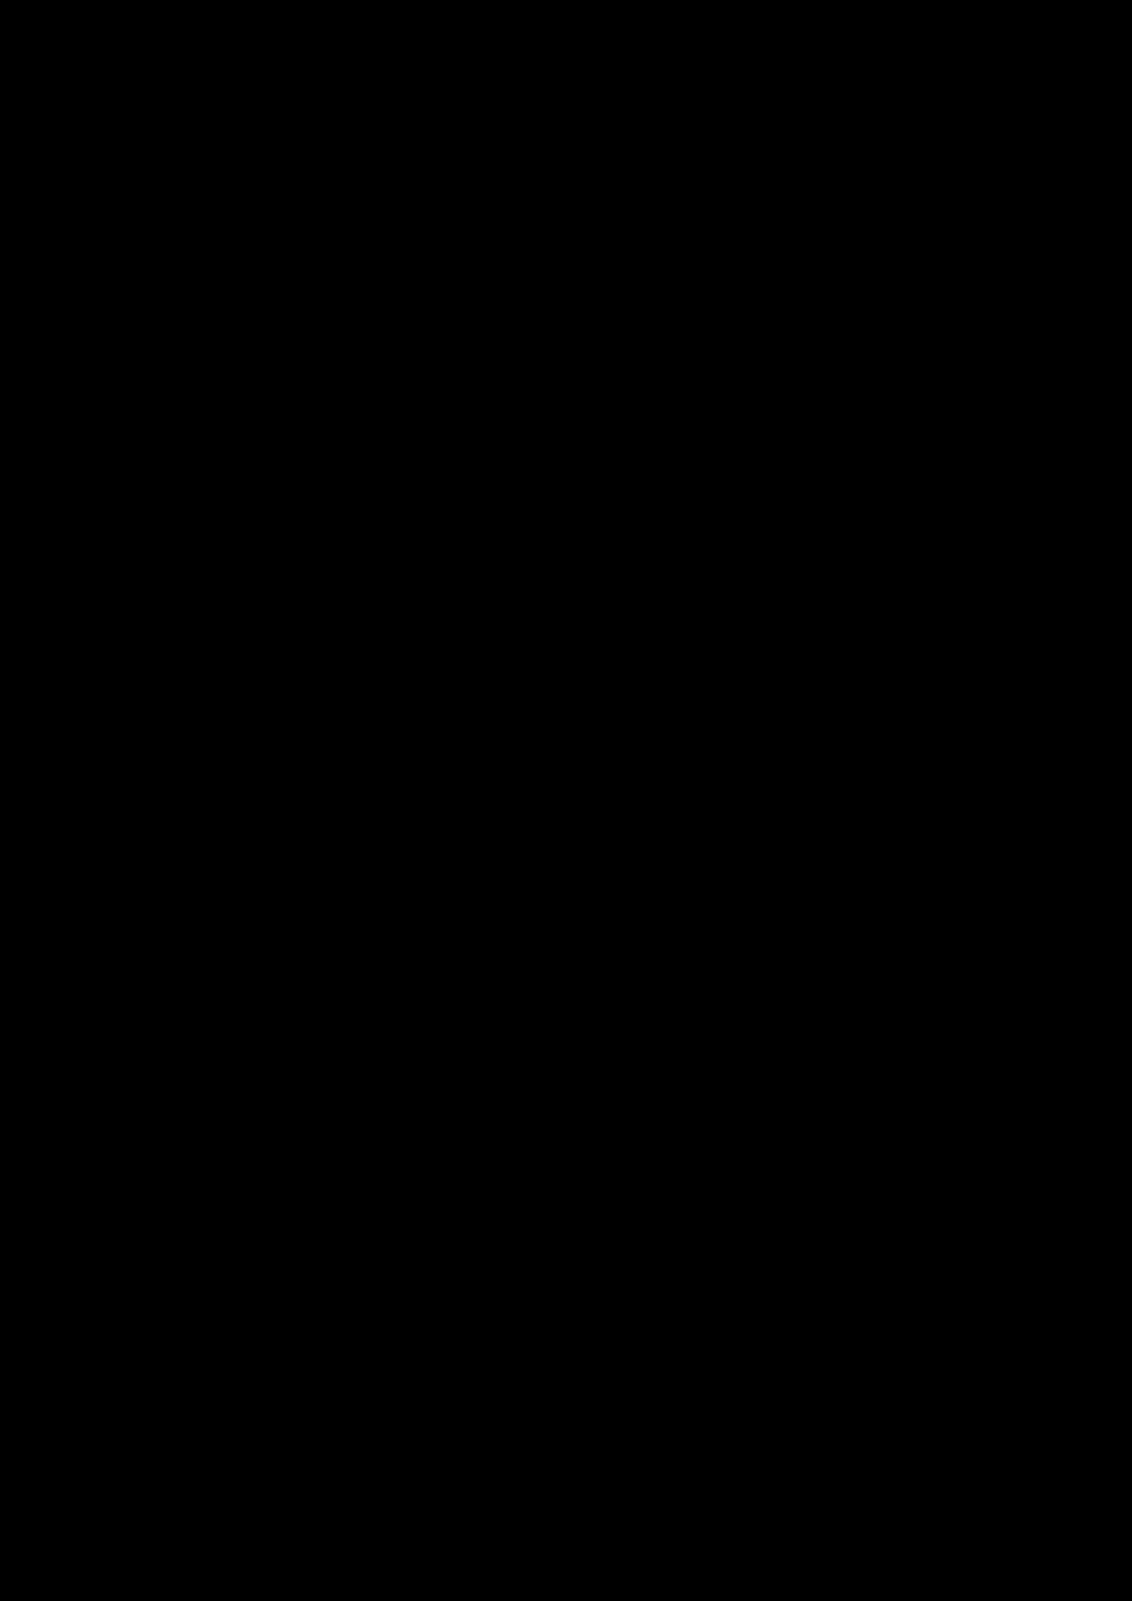 Menshe nas slide, Image 2